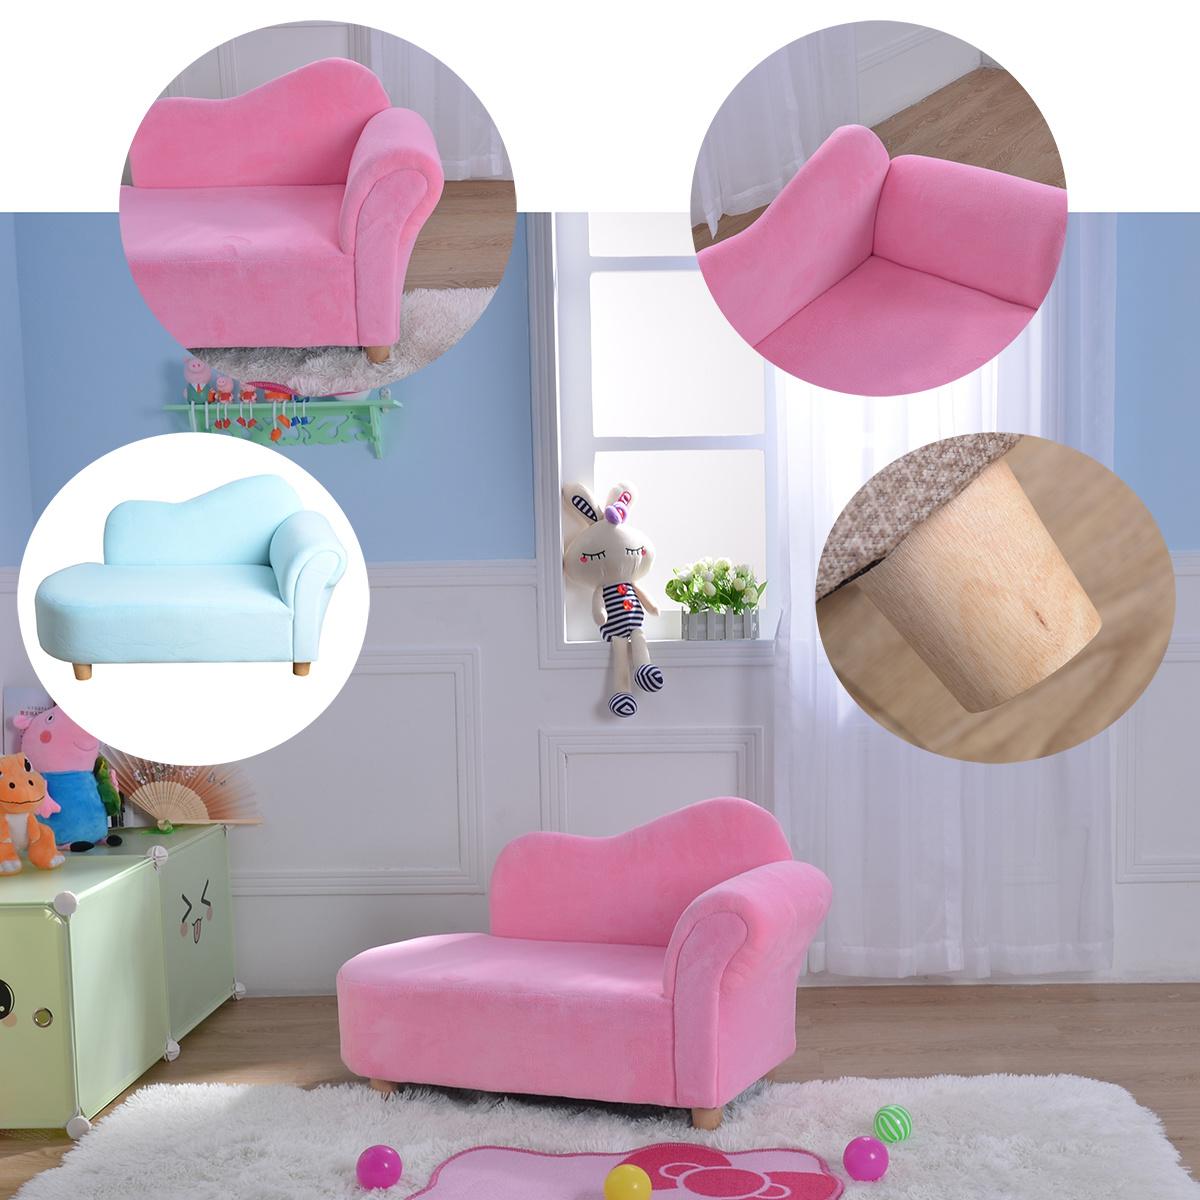 pink velvet plush chaise lounge